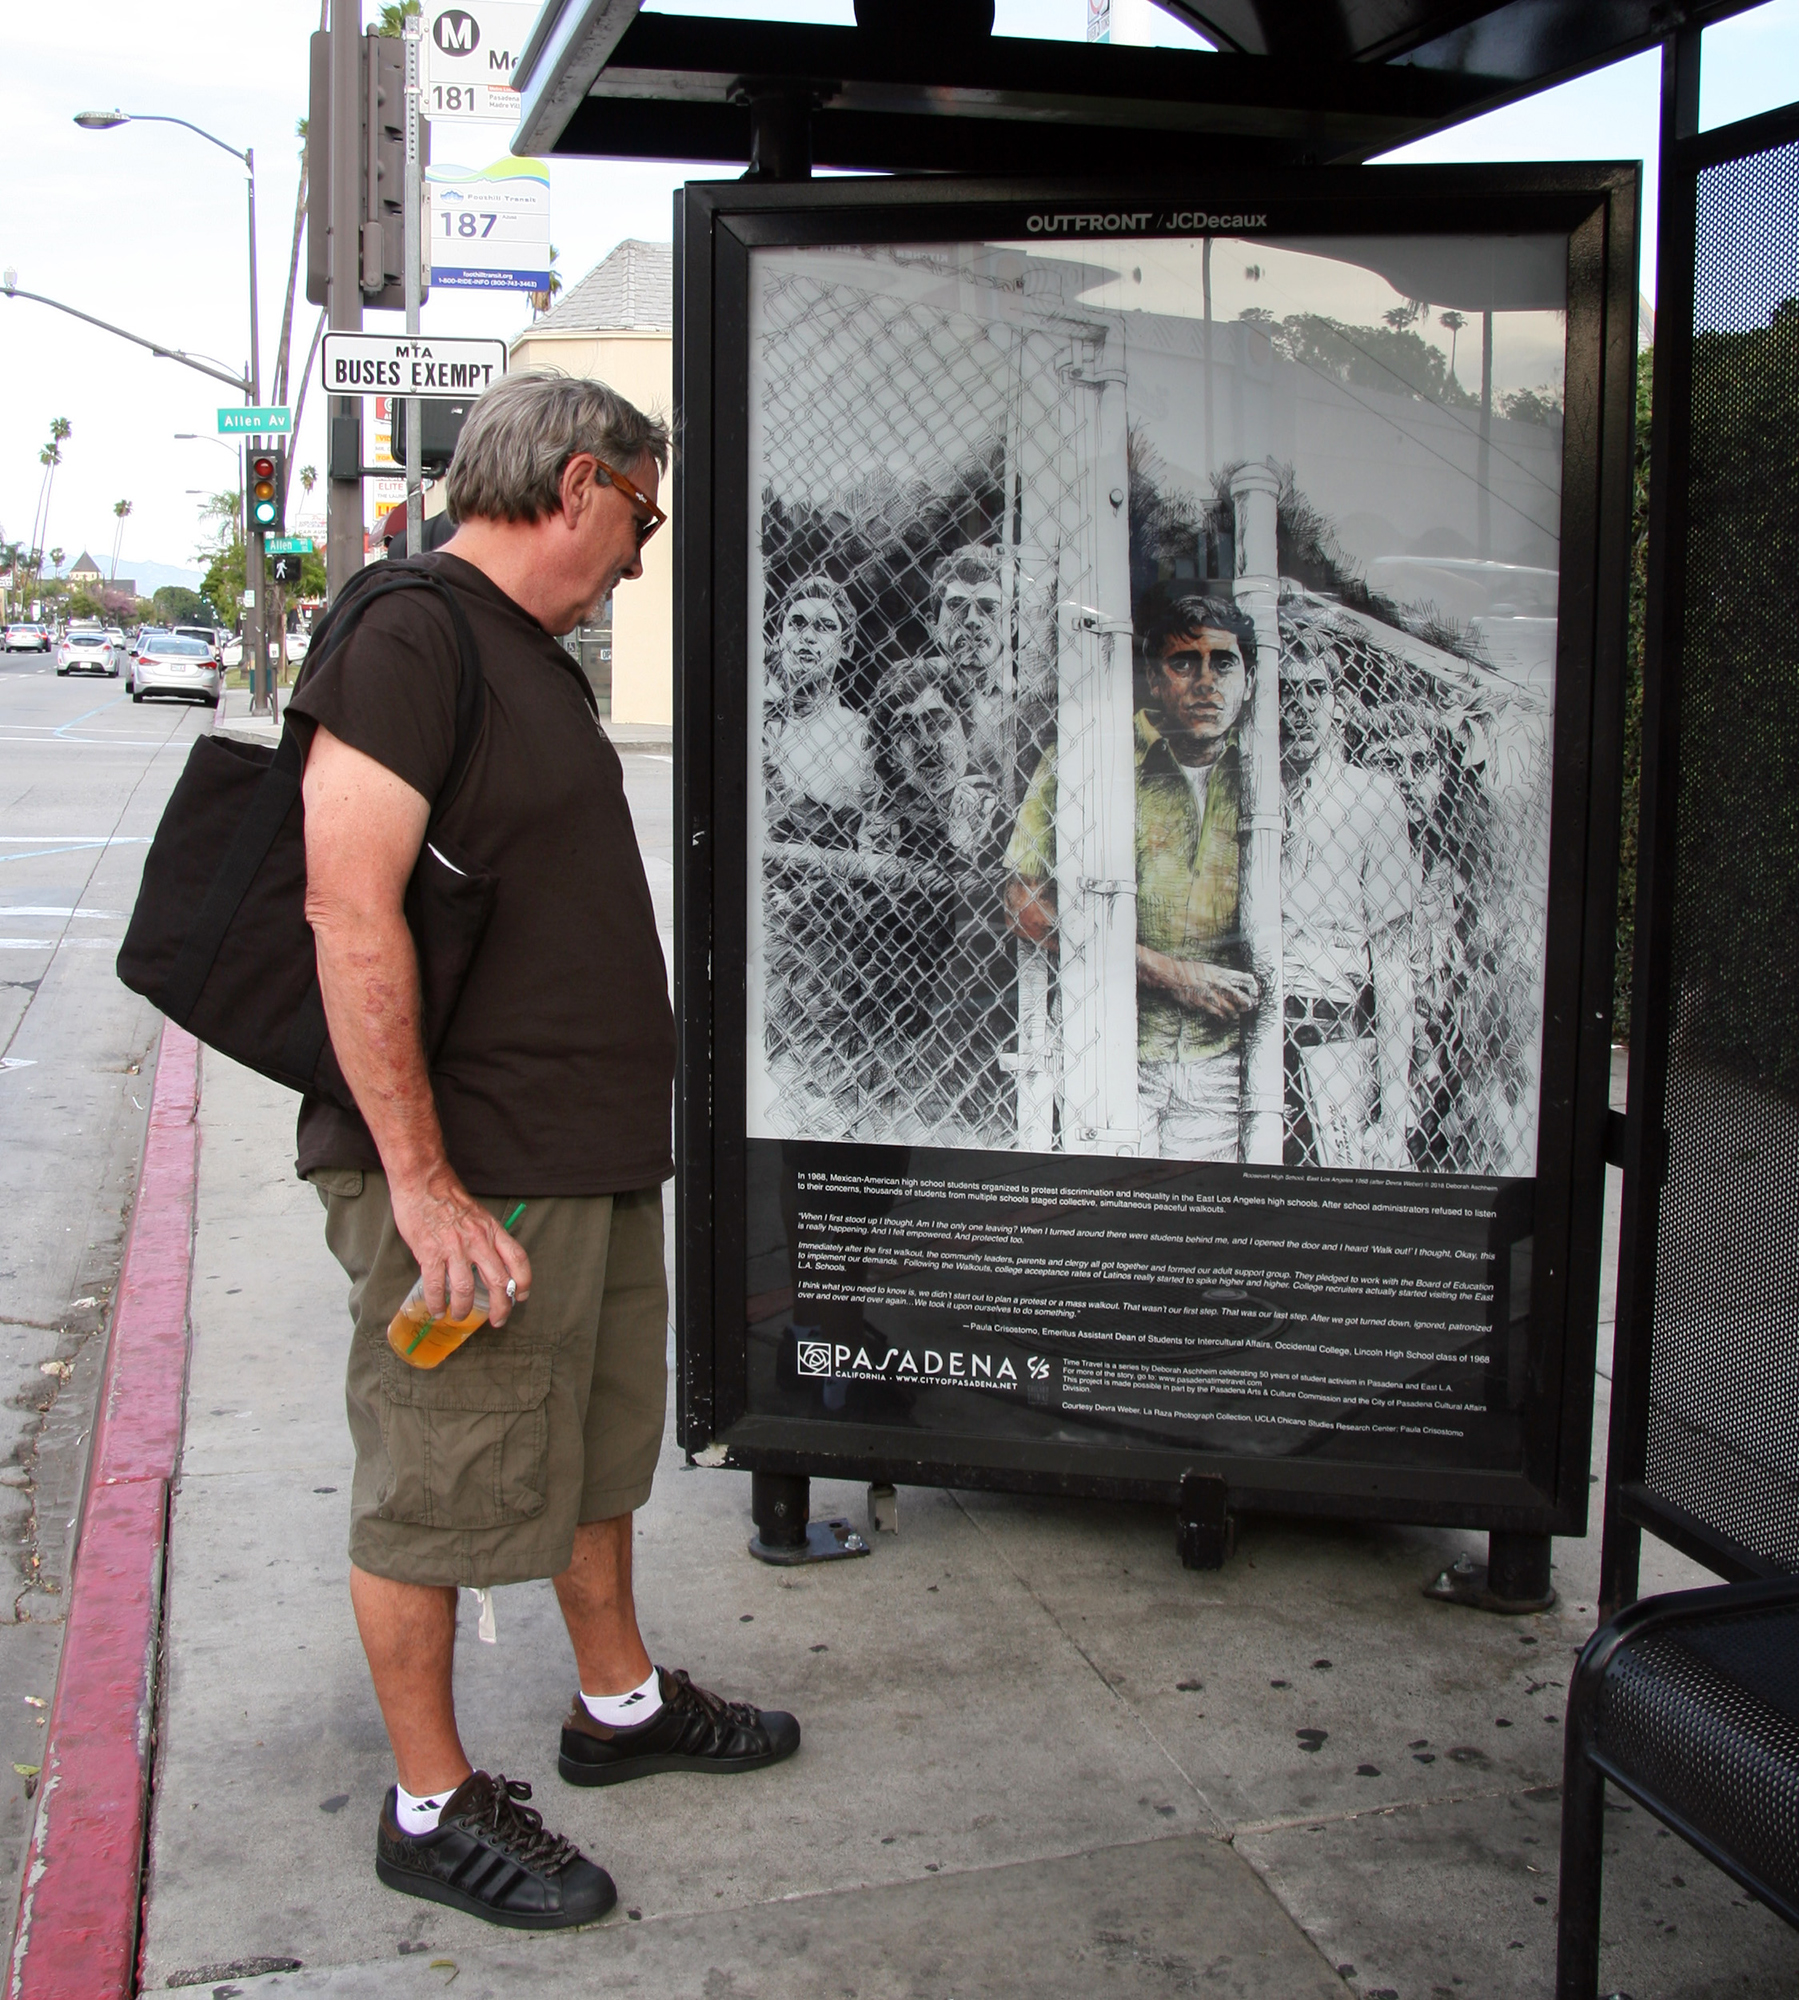 Pasadena Time Travel